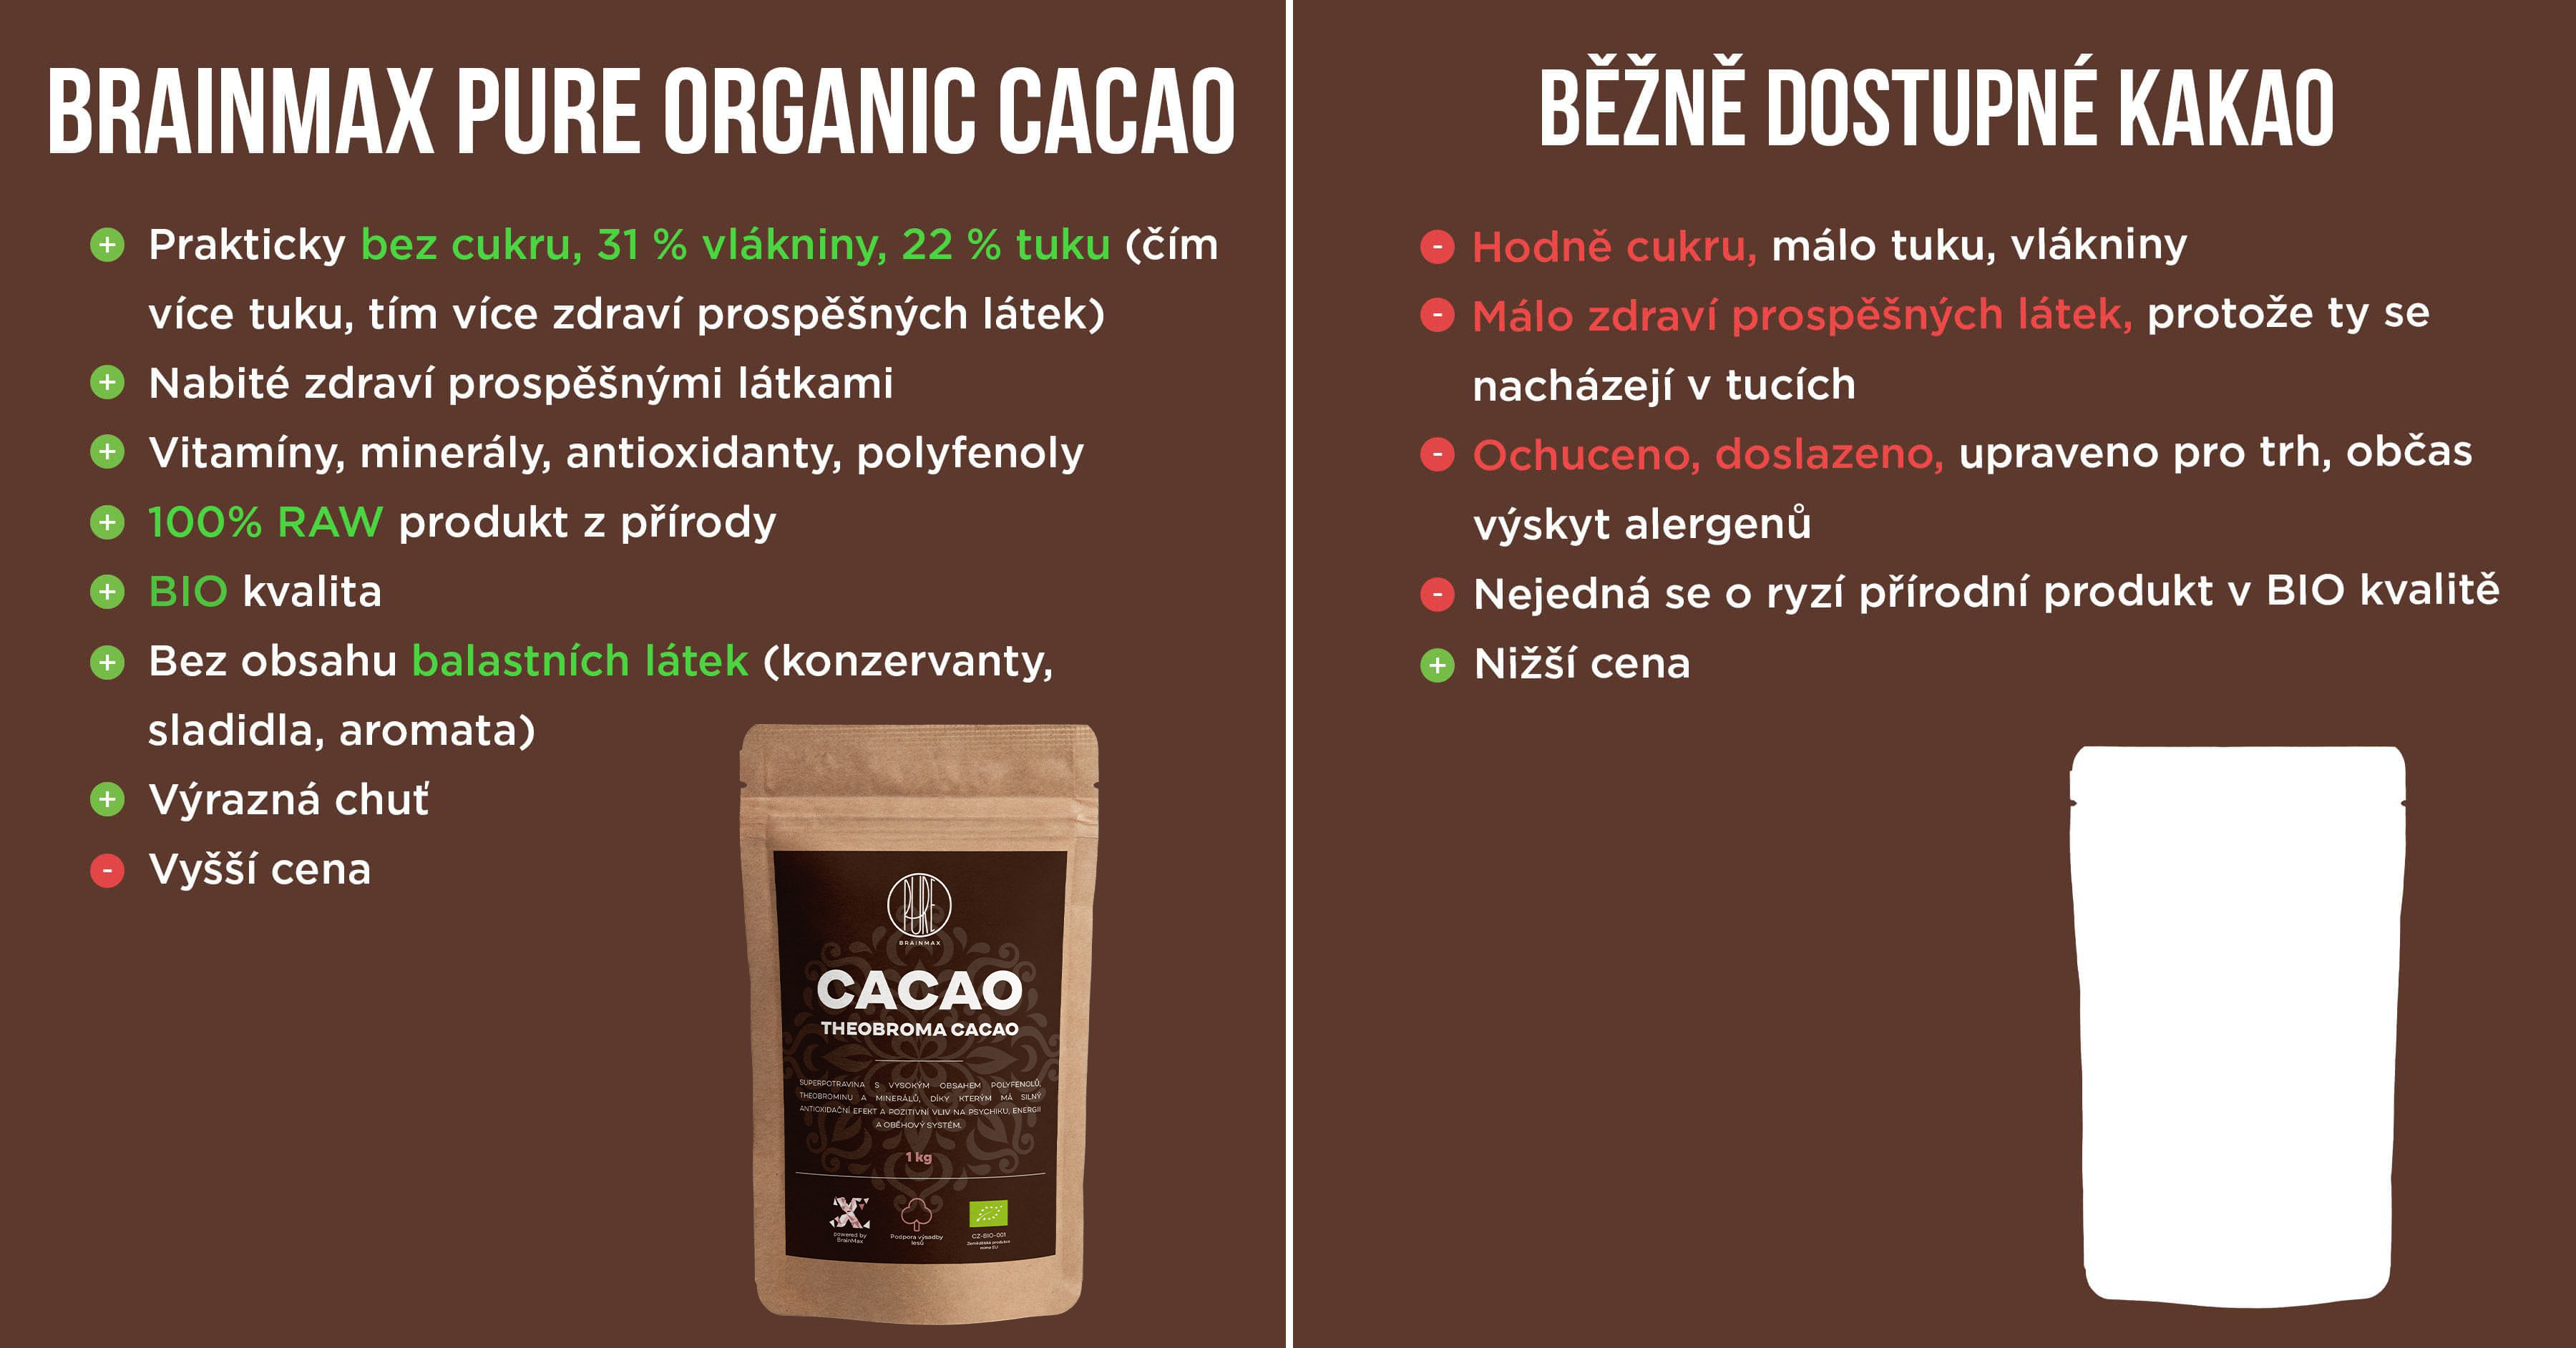 BrainMax Pure Cacao, Bio Kakao z Peru, 500 g